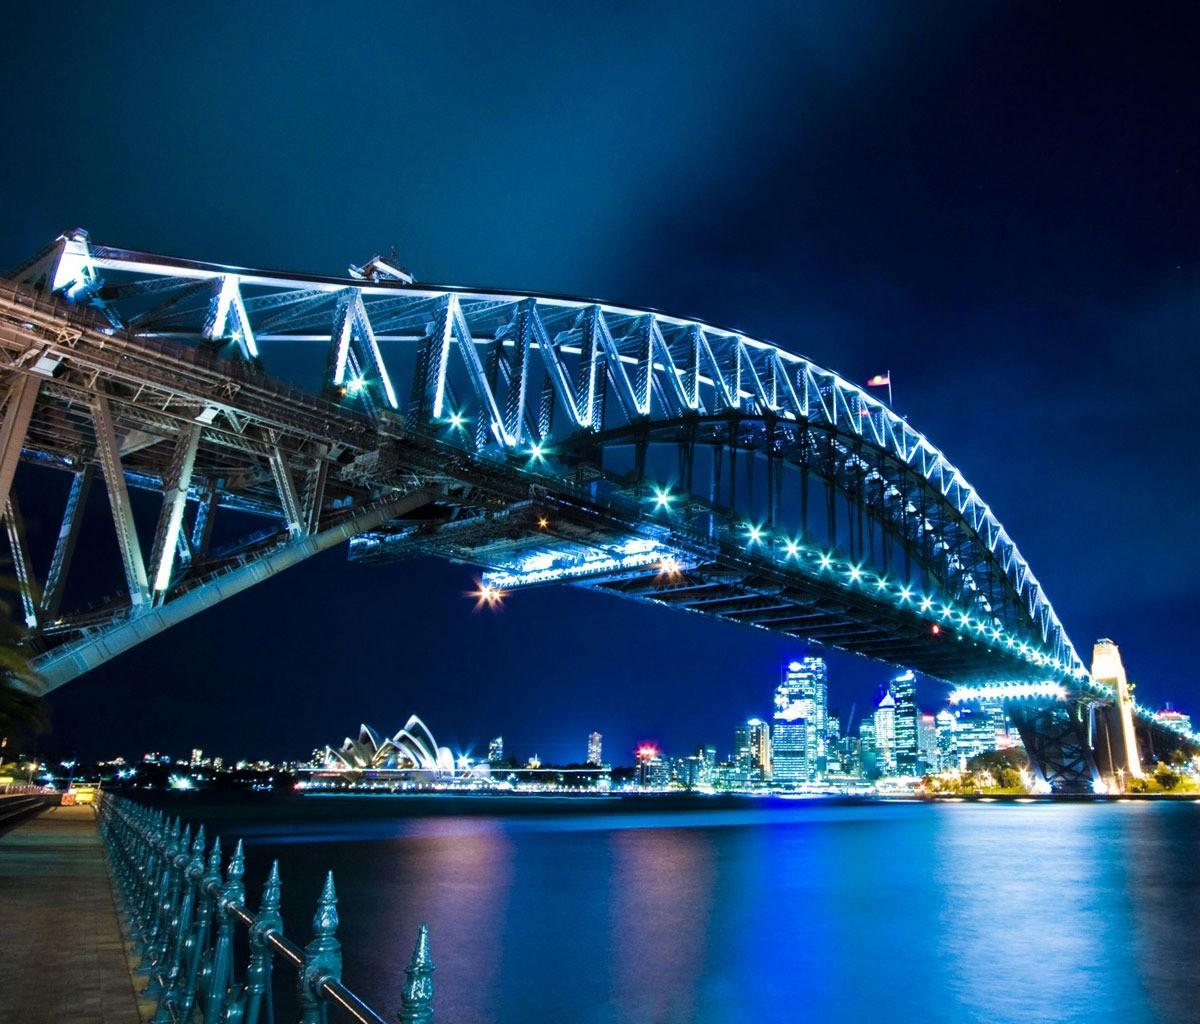 http://1.bp.blogspot.com/-OG5u-jdNUP8/TsGu-yWS9MI/AAAAAAAAAak/tPp6LNNvyNQ/s1600/sydney-harbor-bridge-1200x1024.jpg